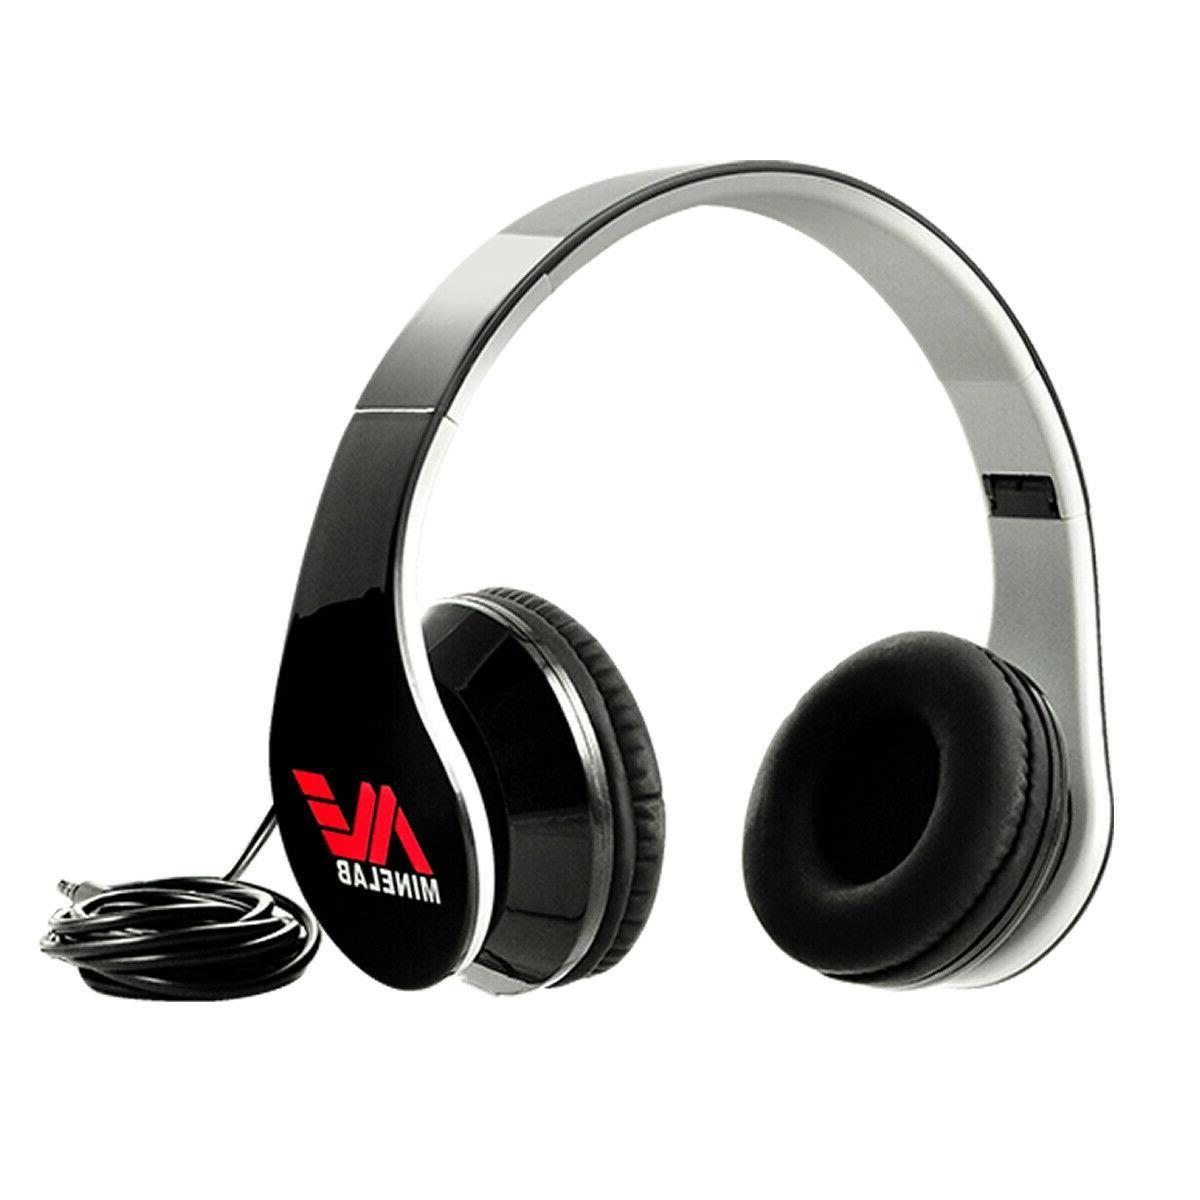 Minelab Vanquish 540 Headphones,